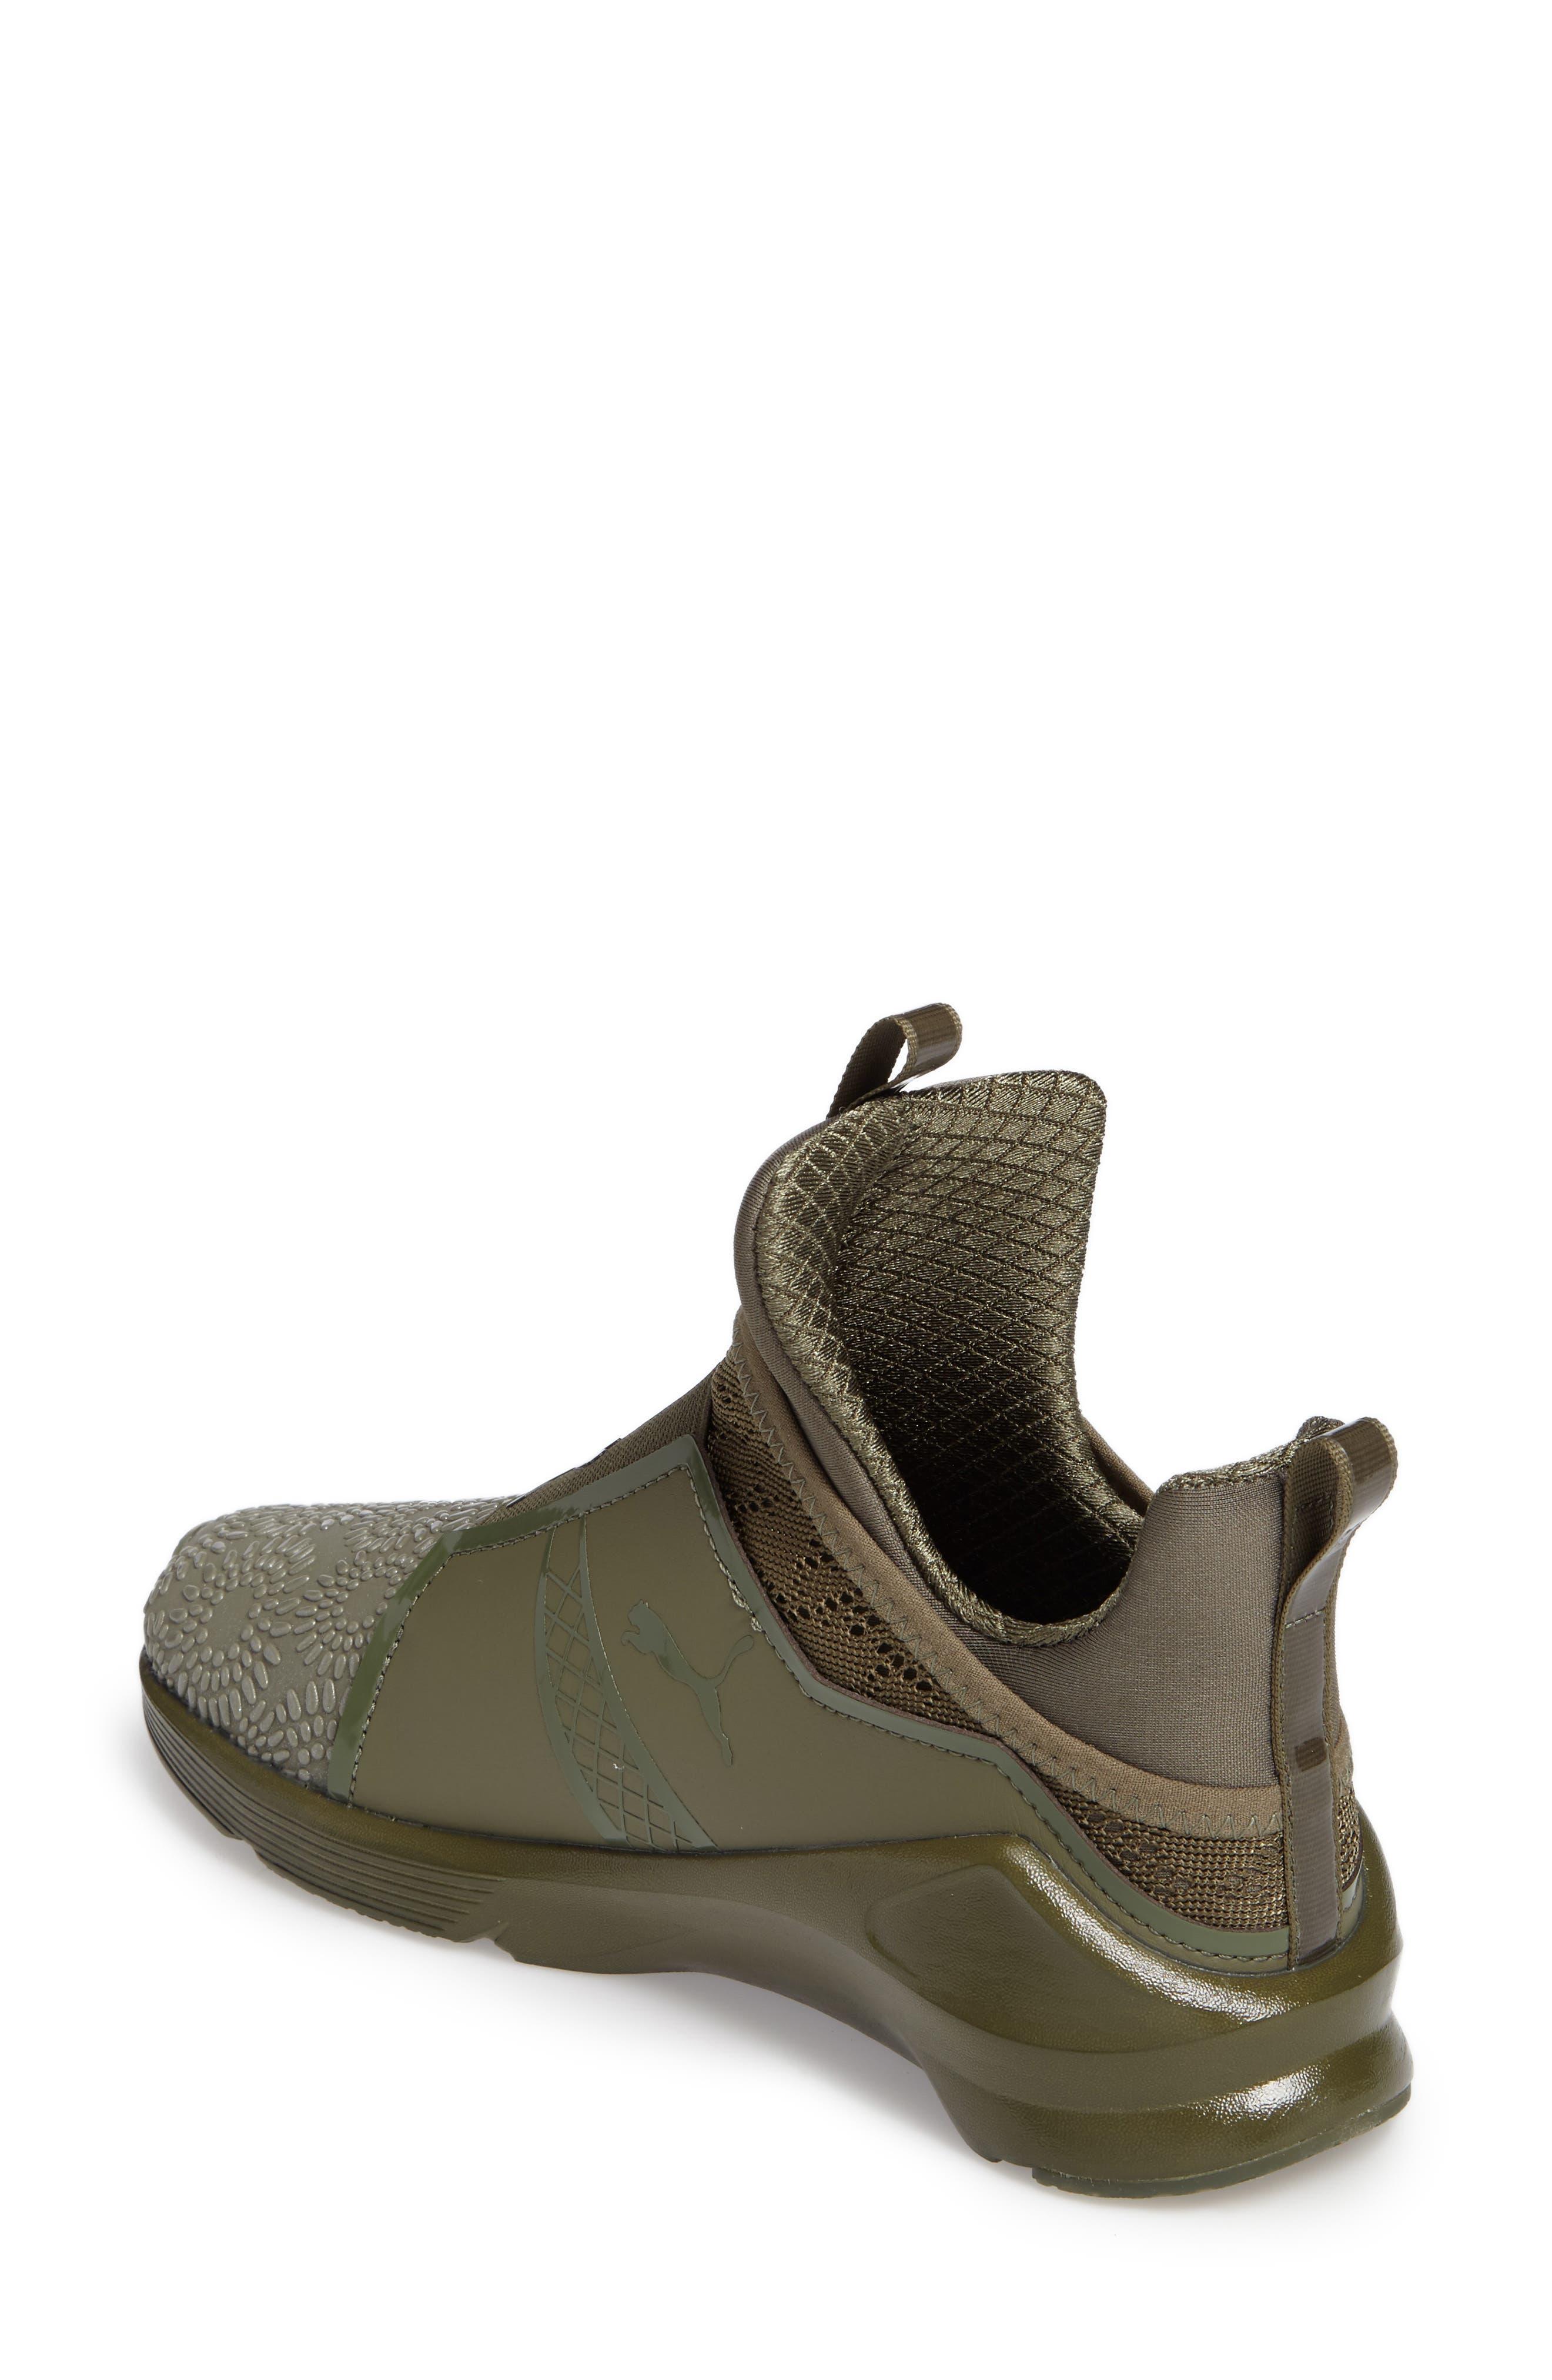 Fierce KRM High Top Sneaker,                             Alternate thumbnail 4, color,